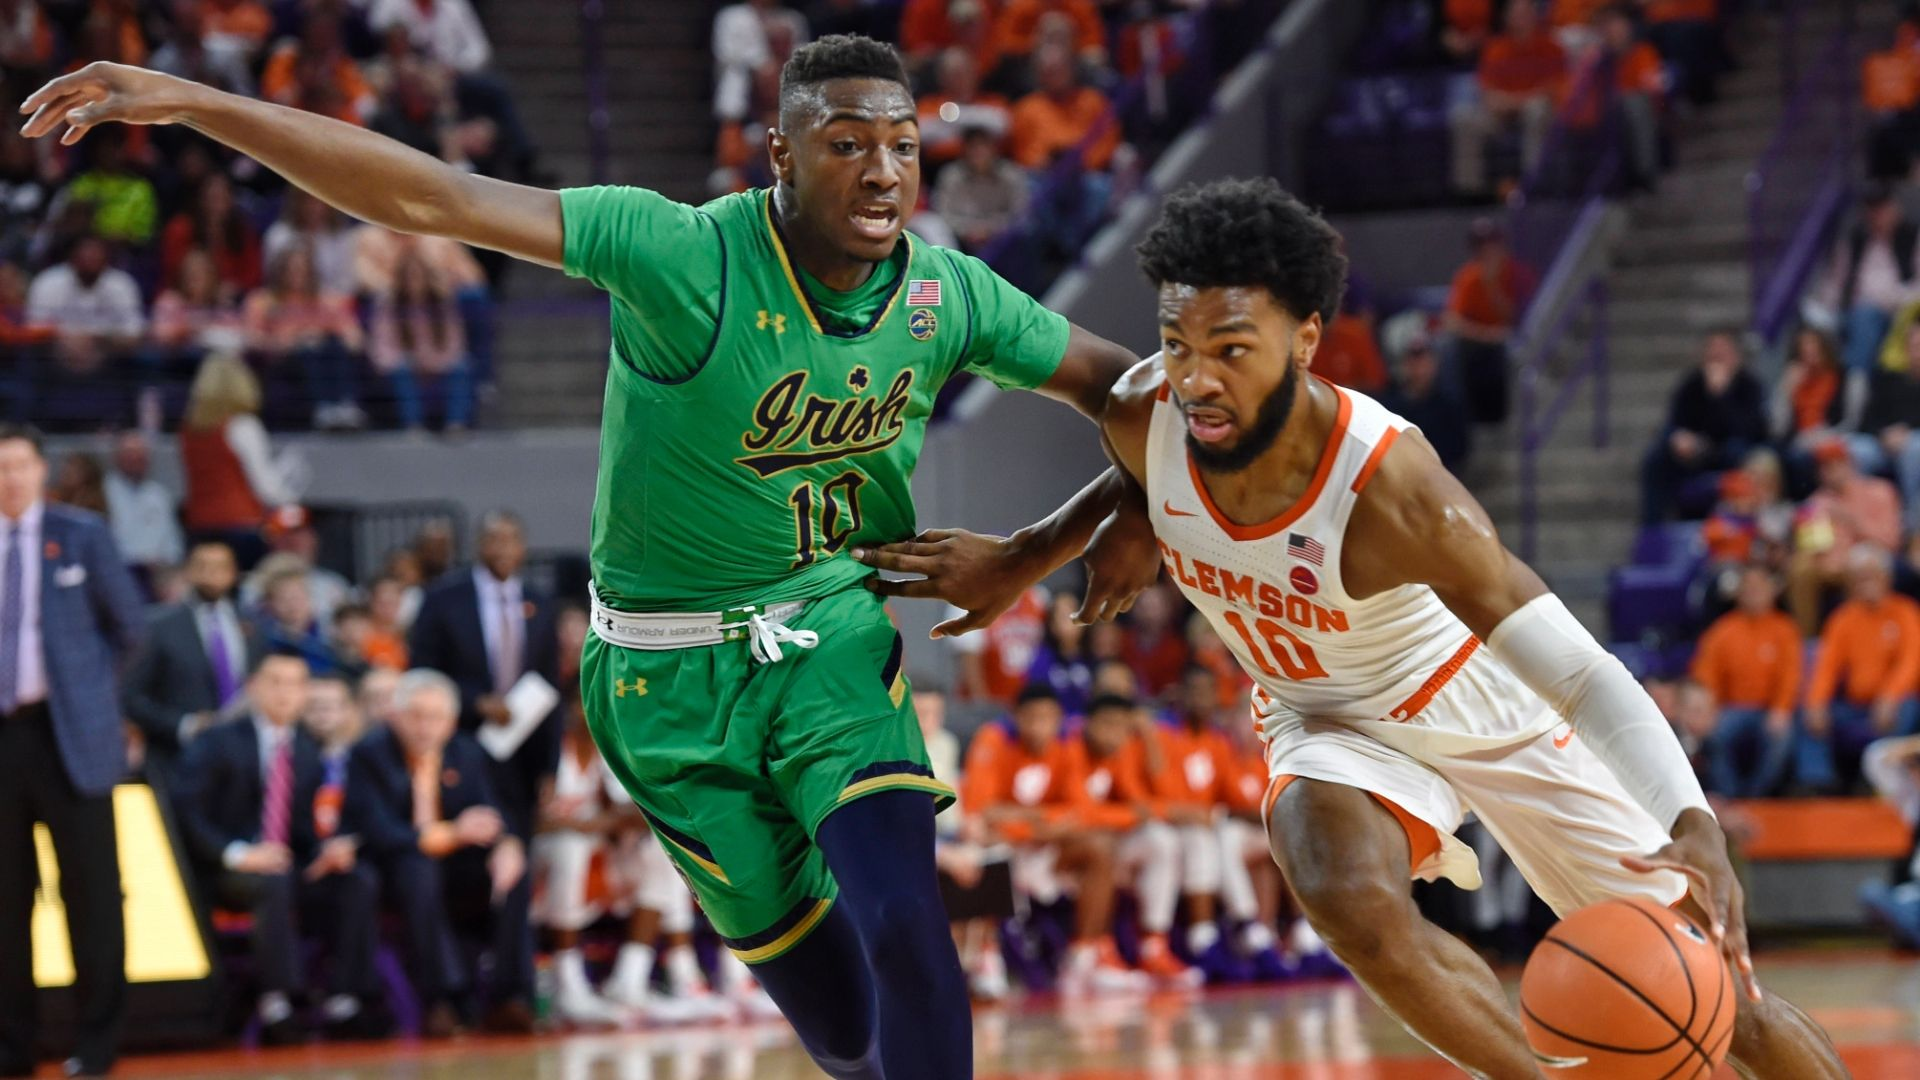 Clemson holds off Notre Dame